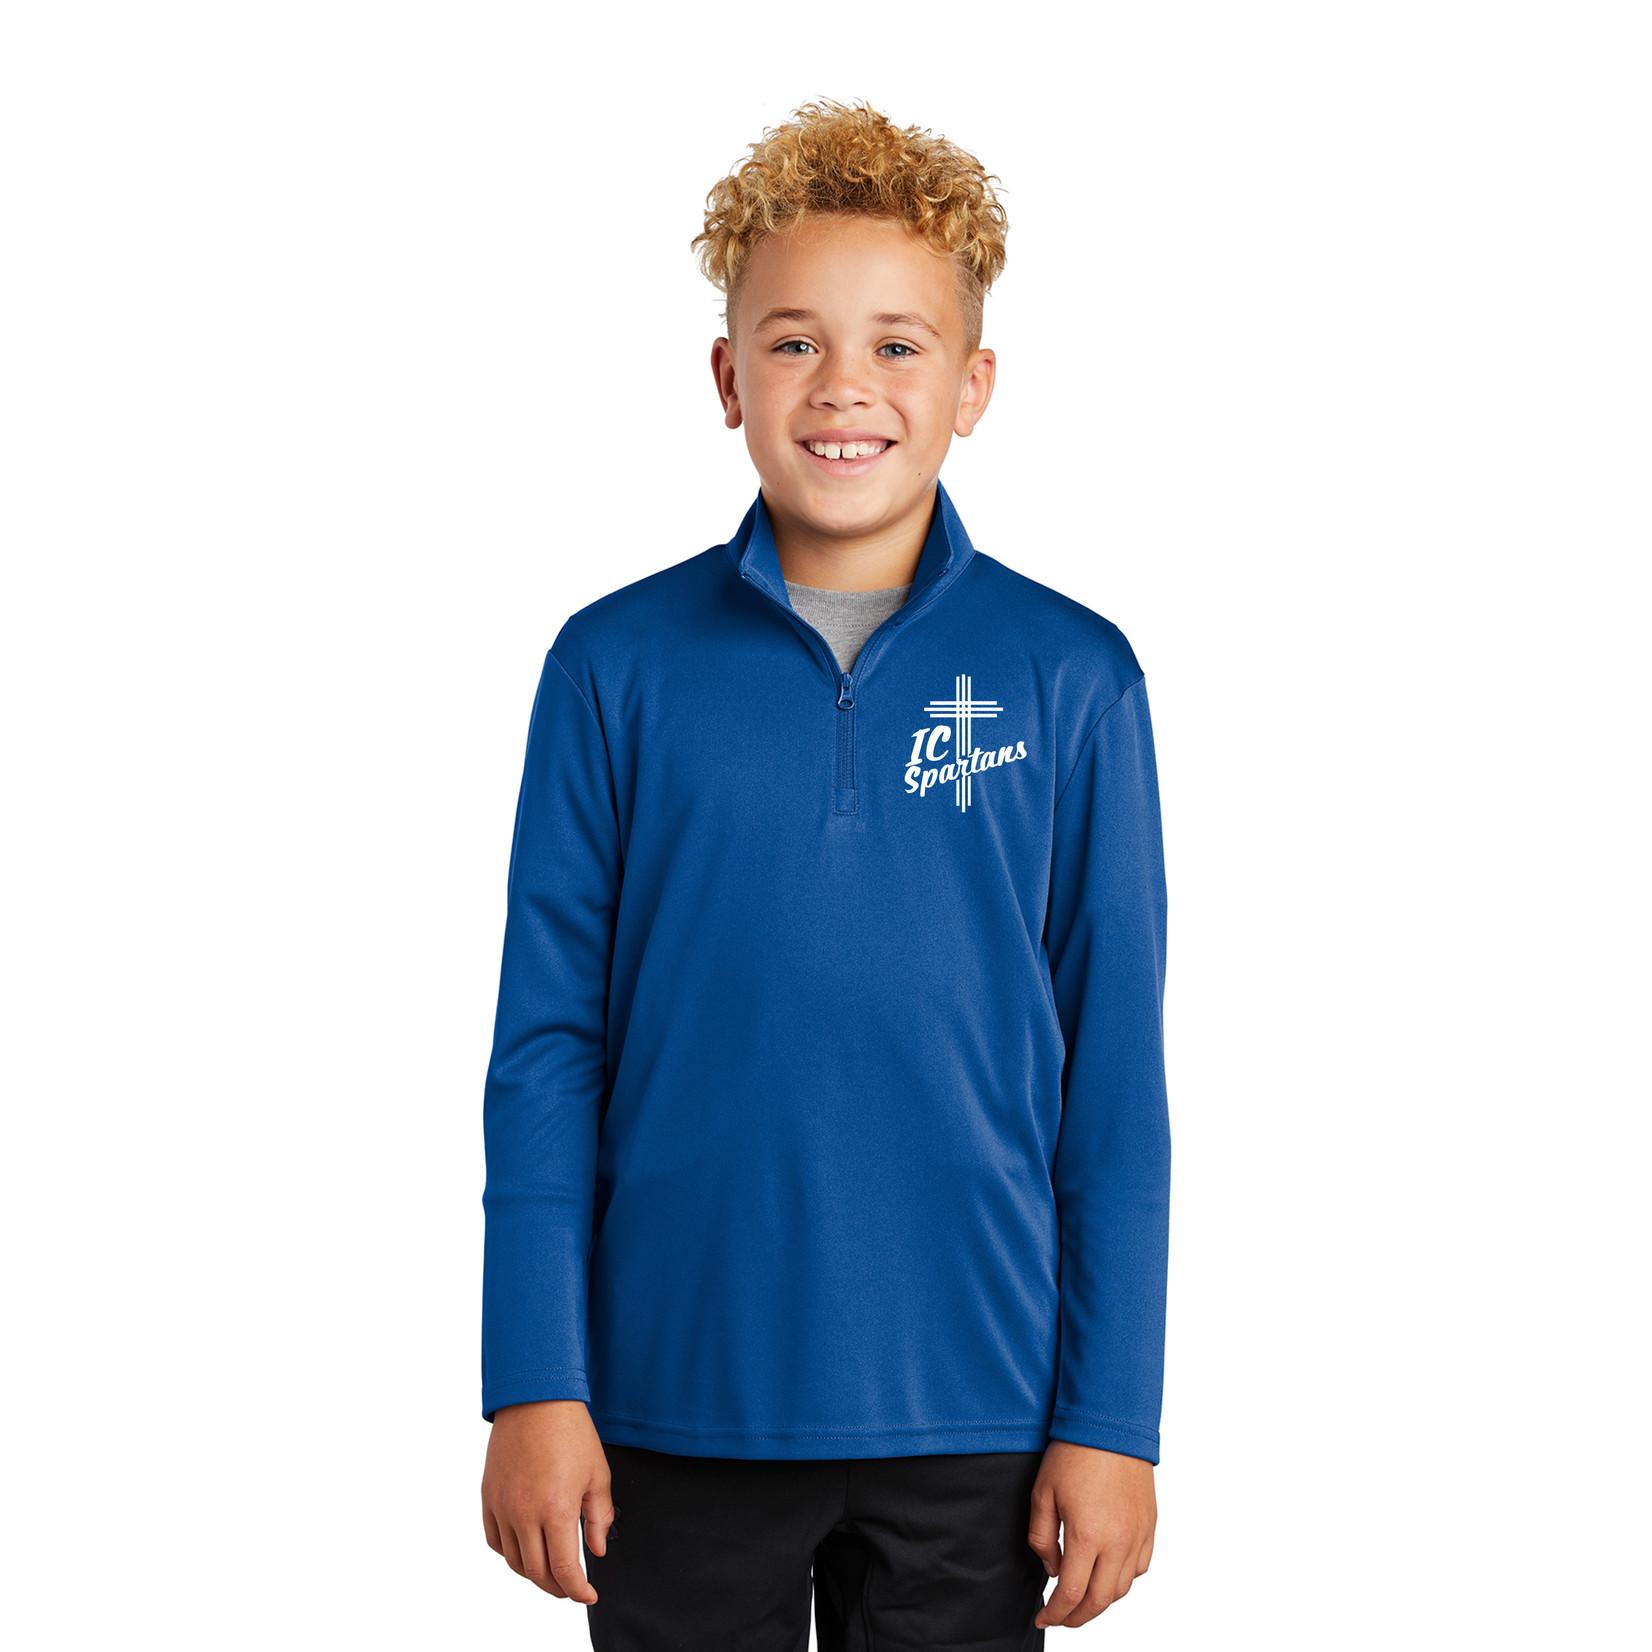 Sport-Tek YOUTH Lightweight 1/4 Zip Pullover